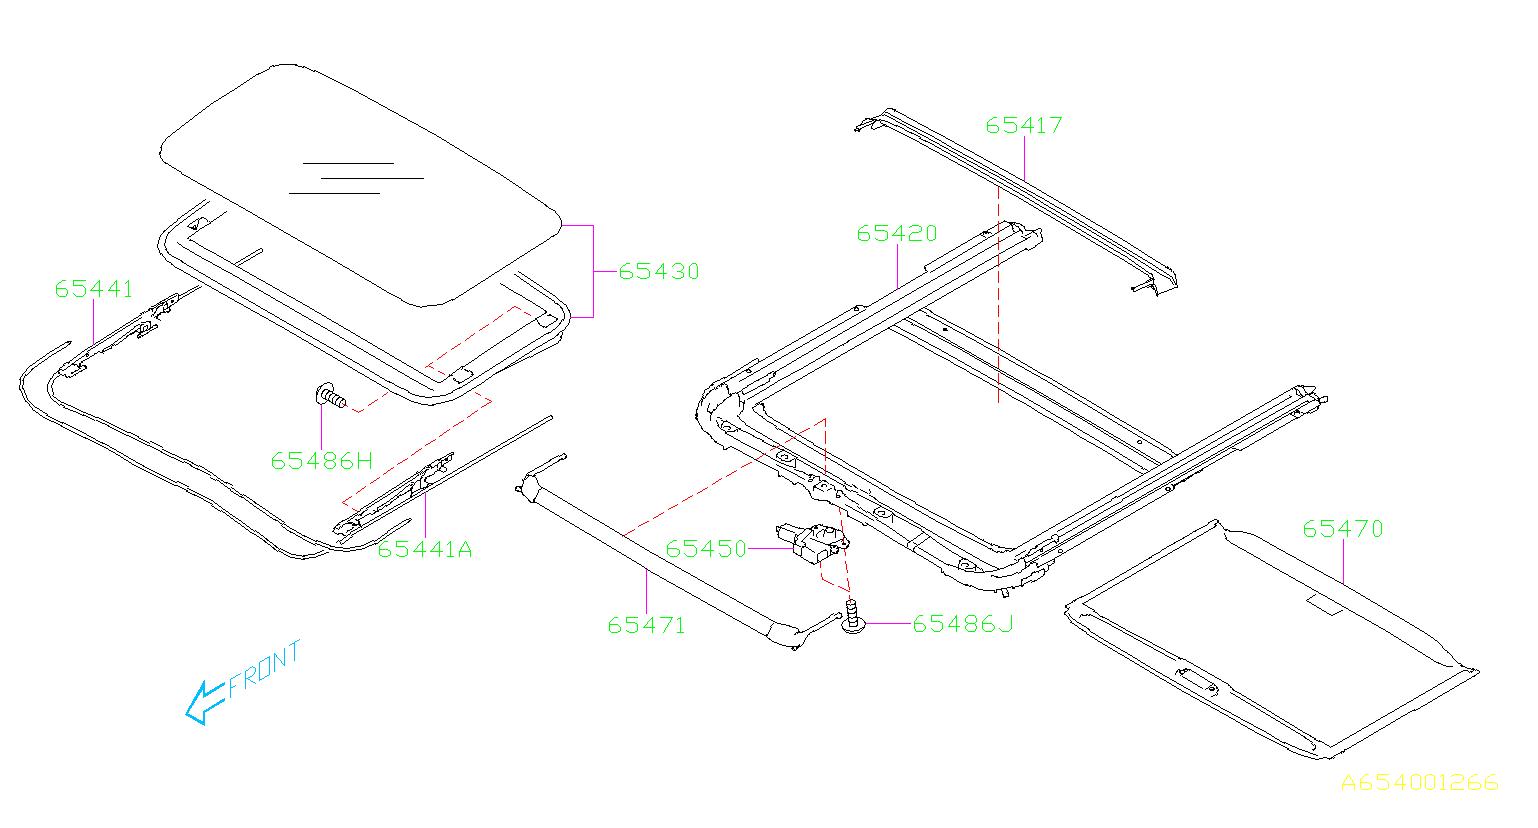 2018 Subaru Outback Screw-sun roof. Body, sunroof